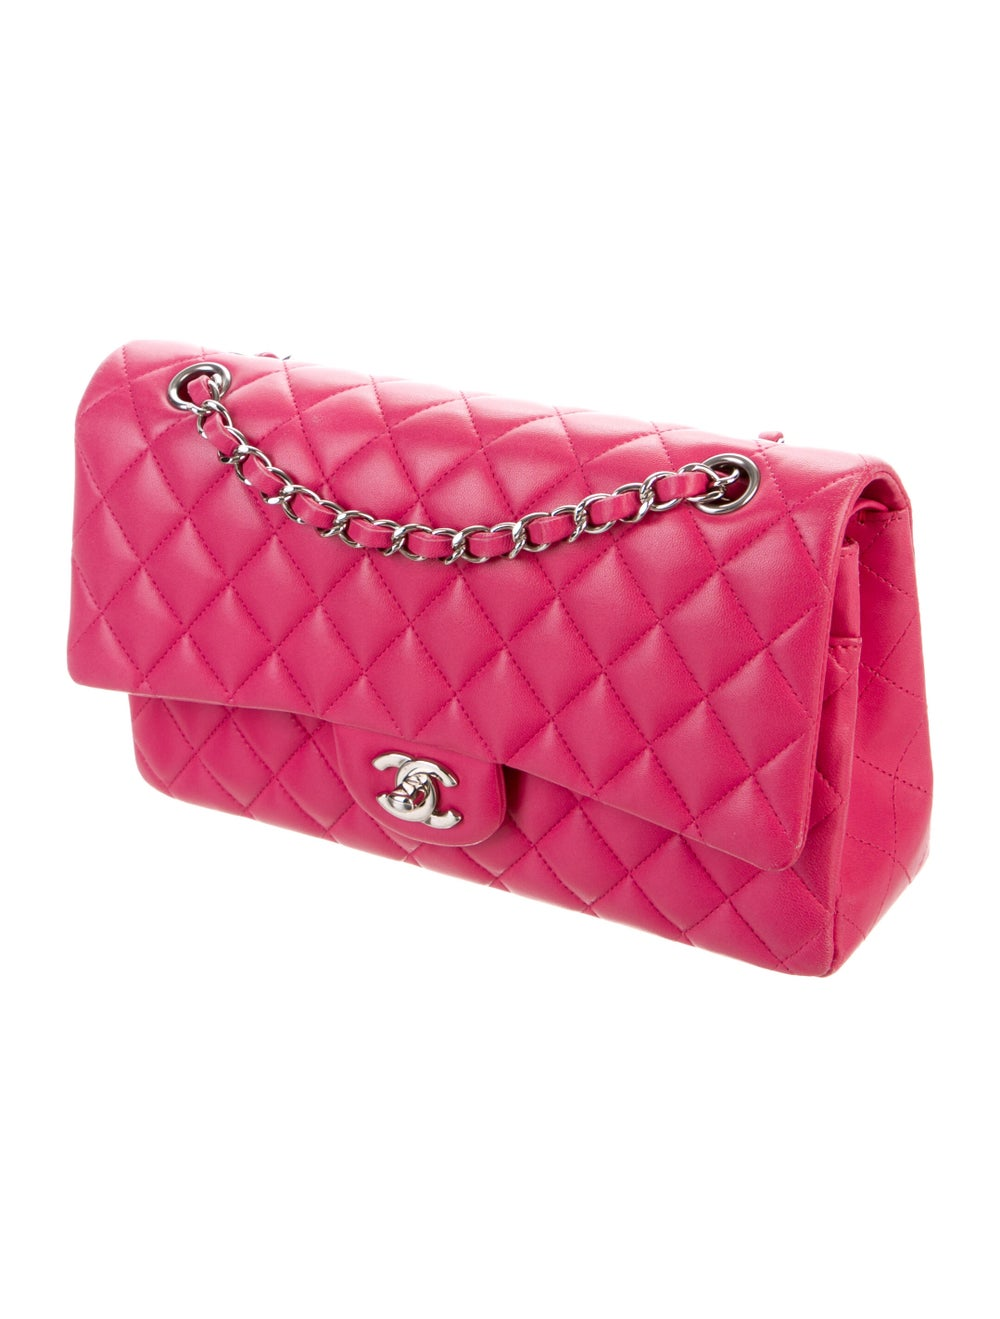 Chanel Classic Medium Double Flap Bag Pink - image 3